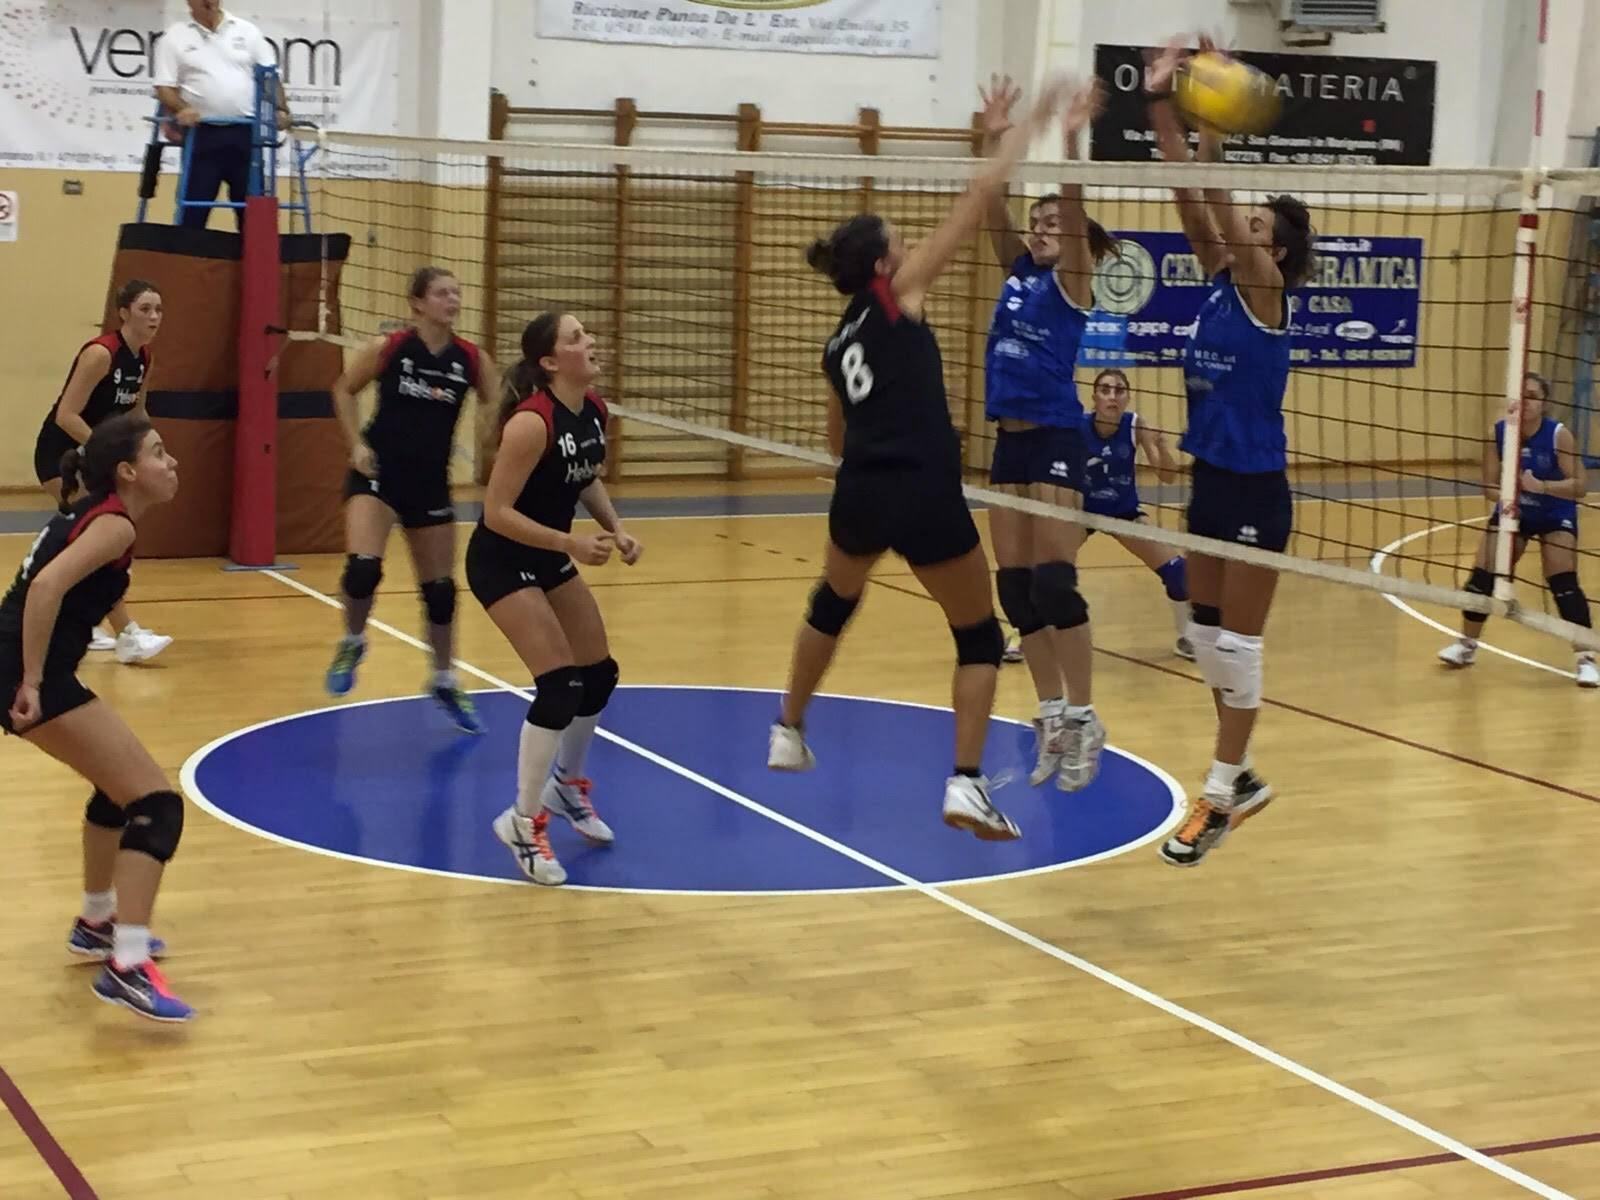 Riccione Volley-Pallavolo Alfonsine